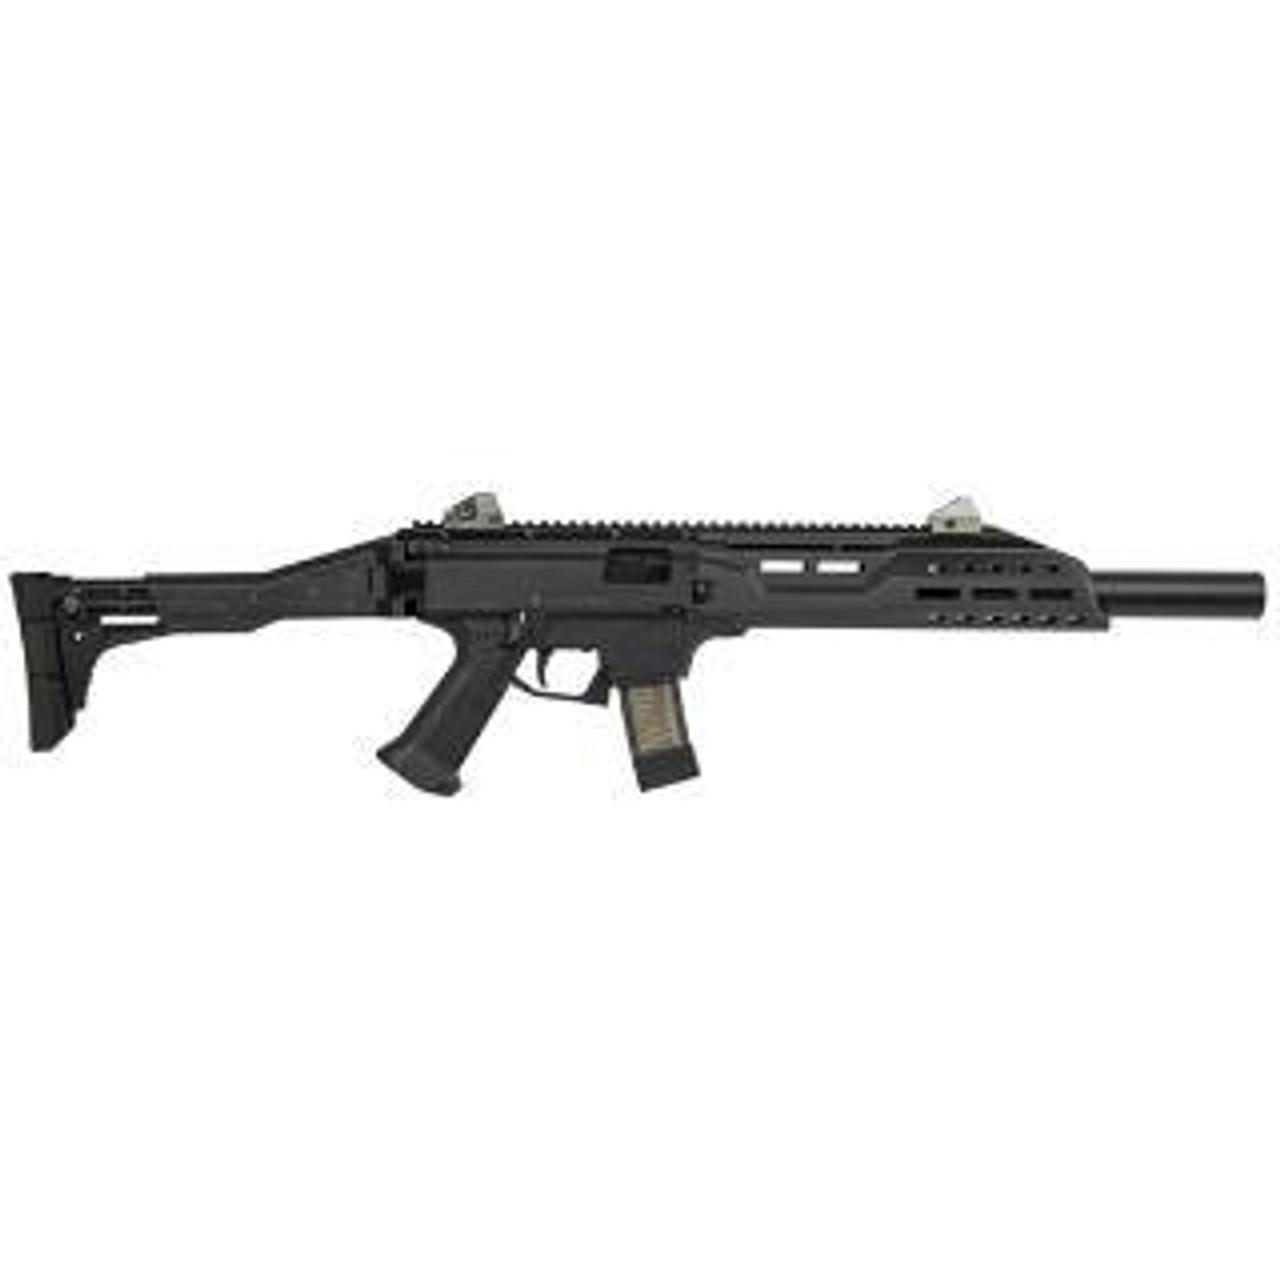 CZ SCORPION EVO Carbine 3 S1 FAUX CALIFORNIA LEGAL - 9mm